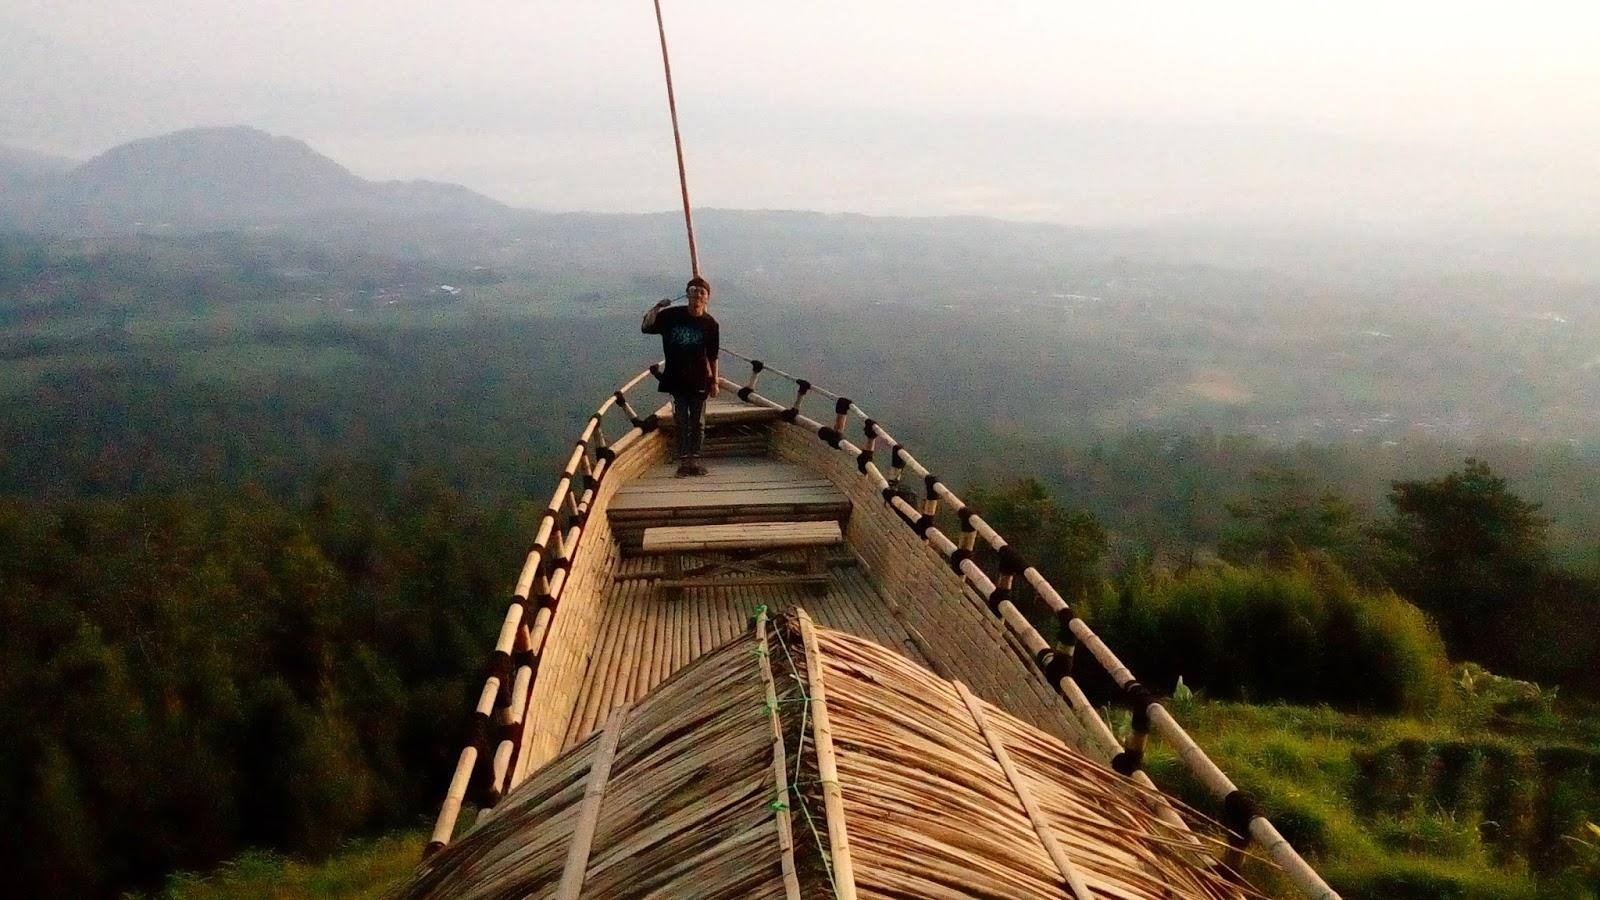 Gardu Pandang Gedong Pass Air Terjun Dusun Spot Berbentuk Kapal